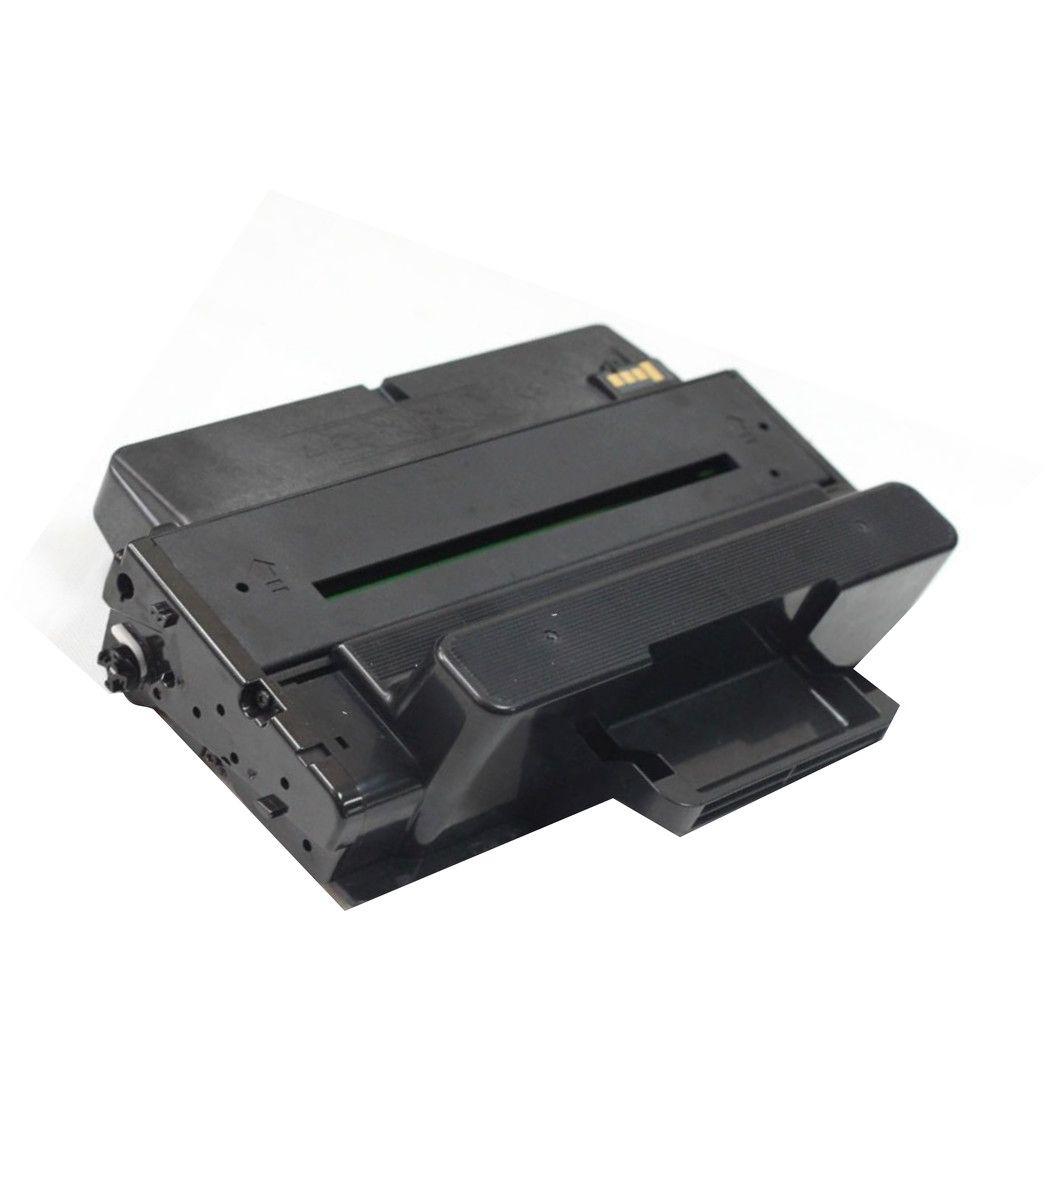 Toner compatível SAMSUNG MLT-D205 MLT-D205E   ML3710 SCX5637 ML3710ND - 10.000 Páginas - Cartucho & Cia